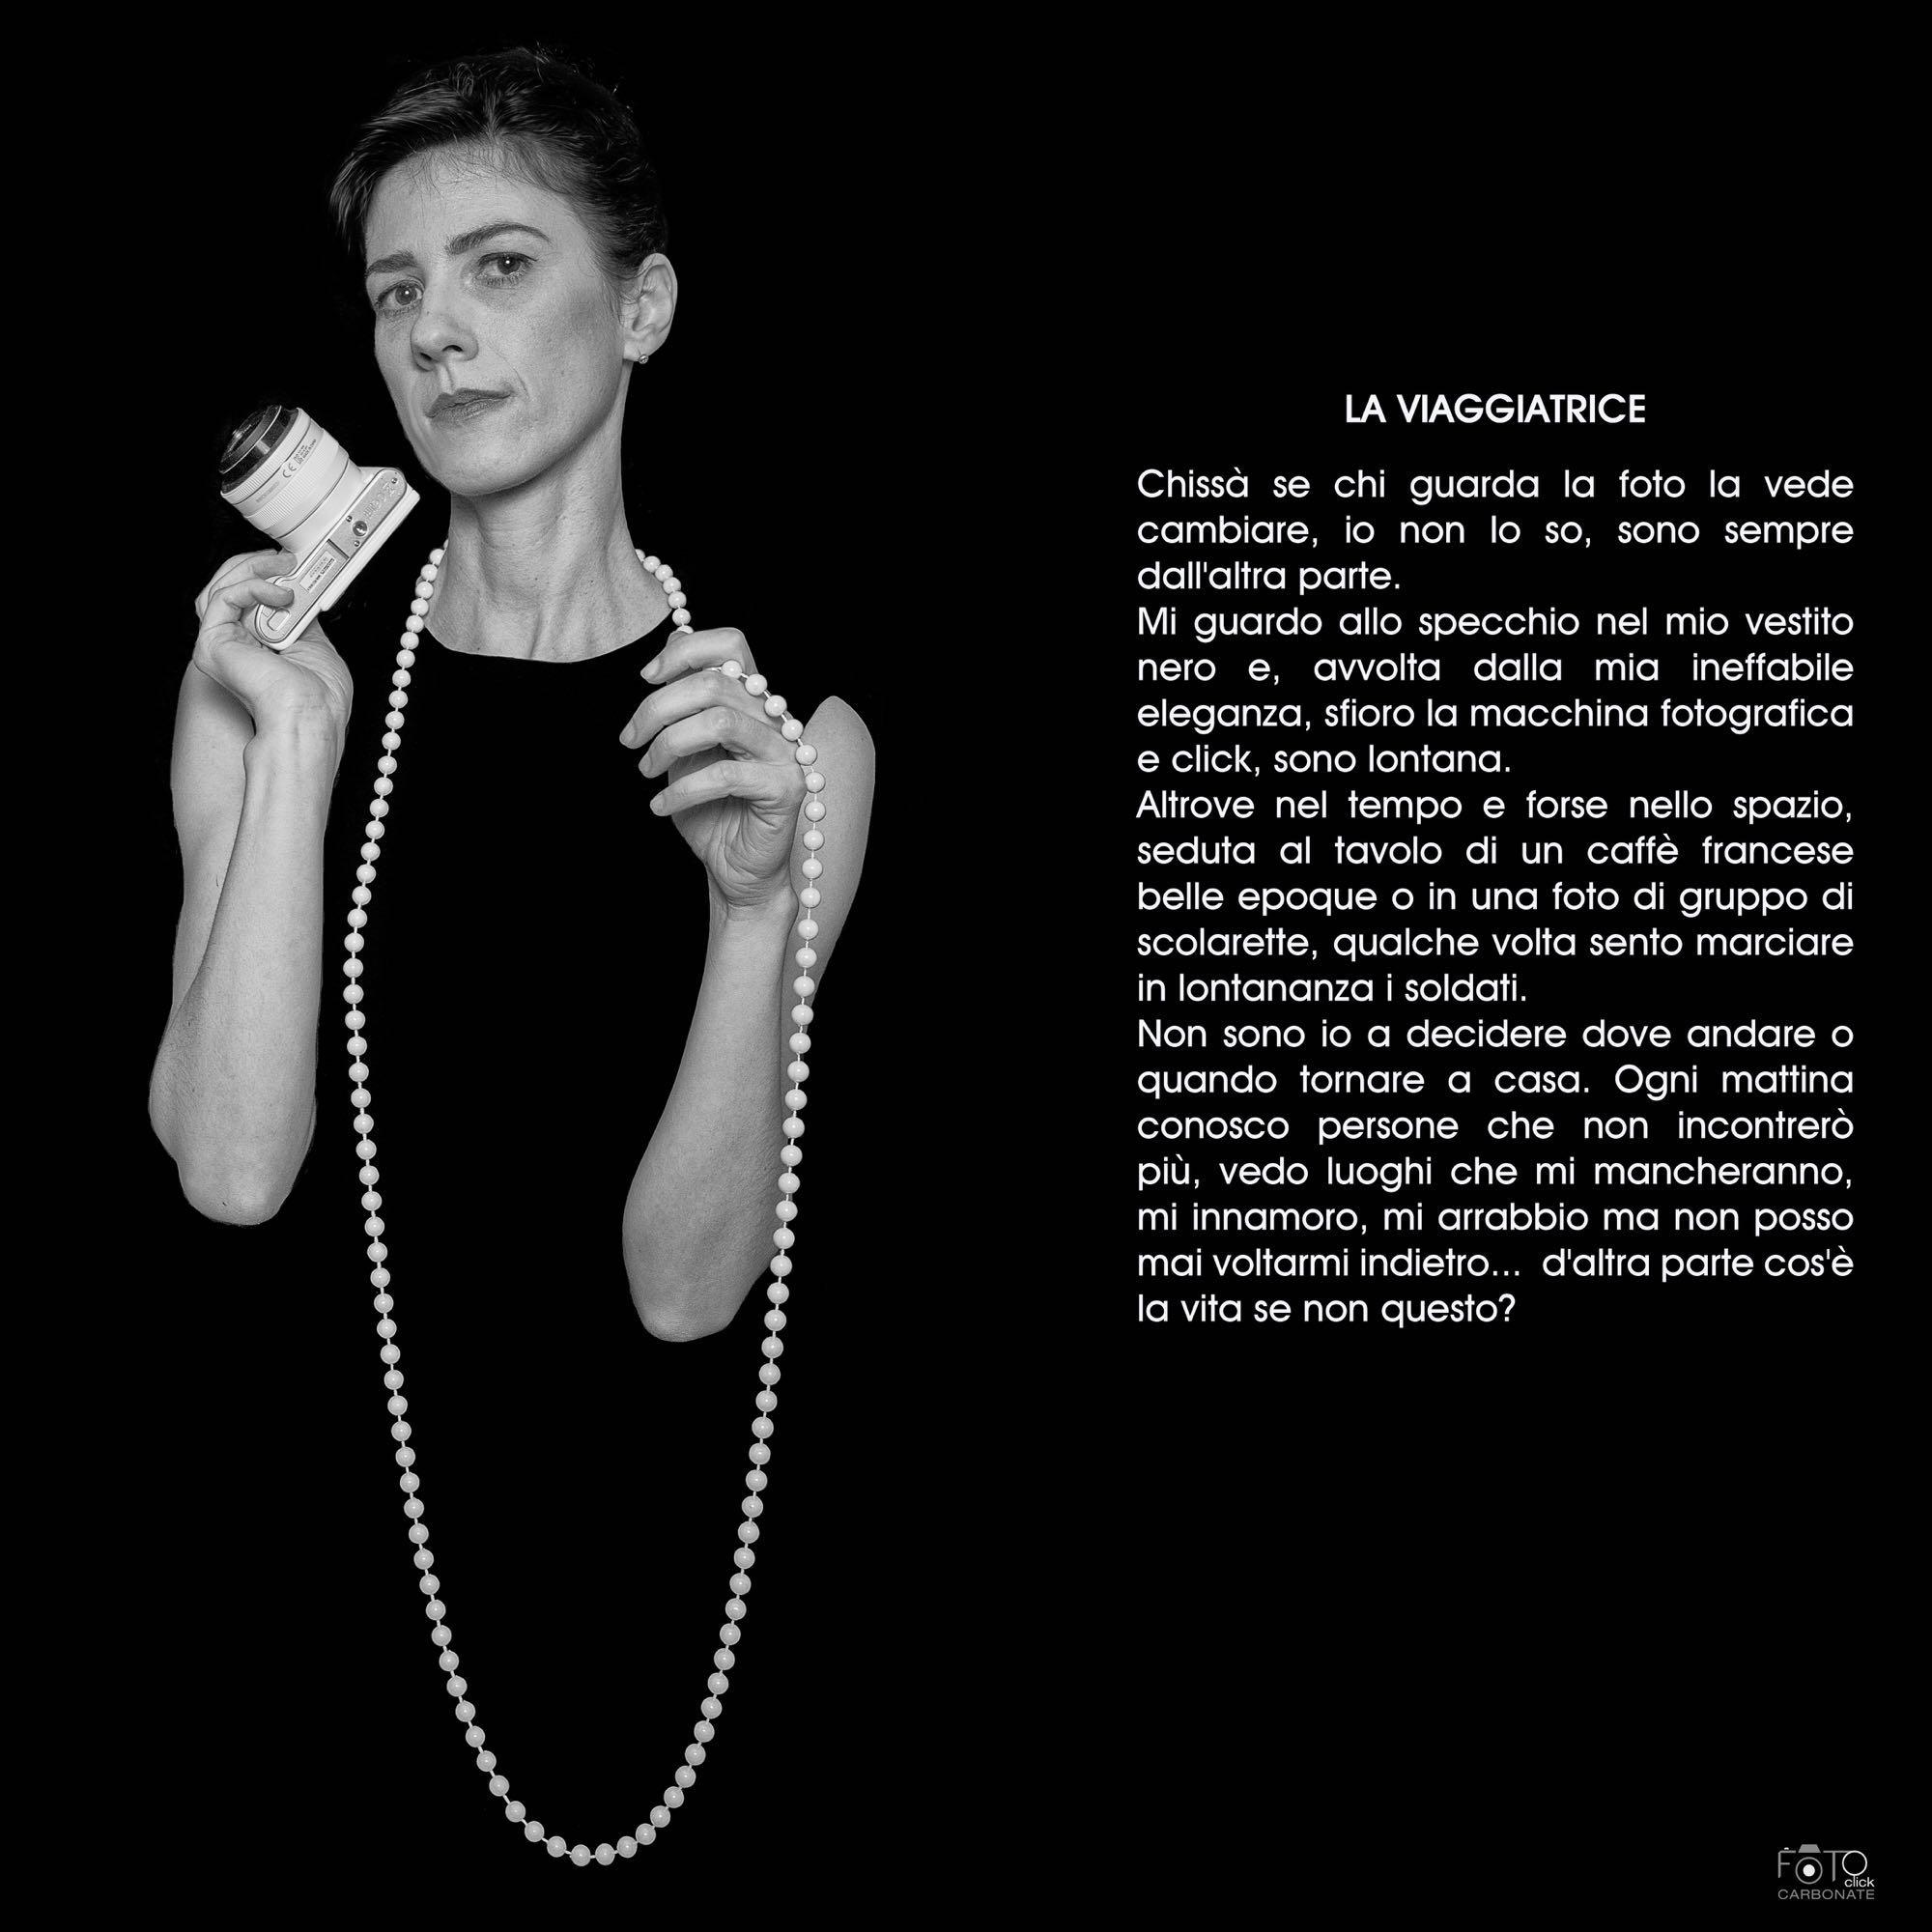 novantuno - 15